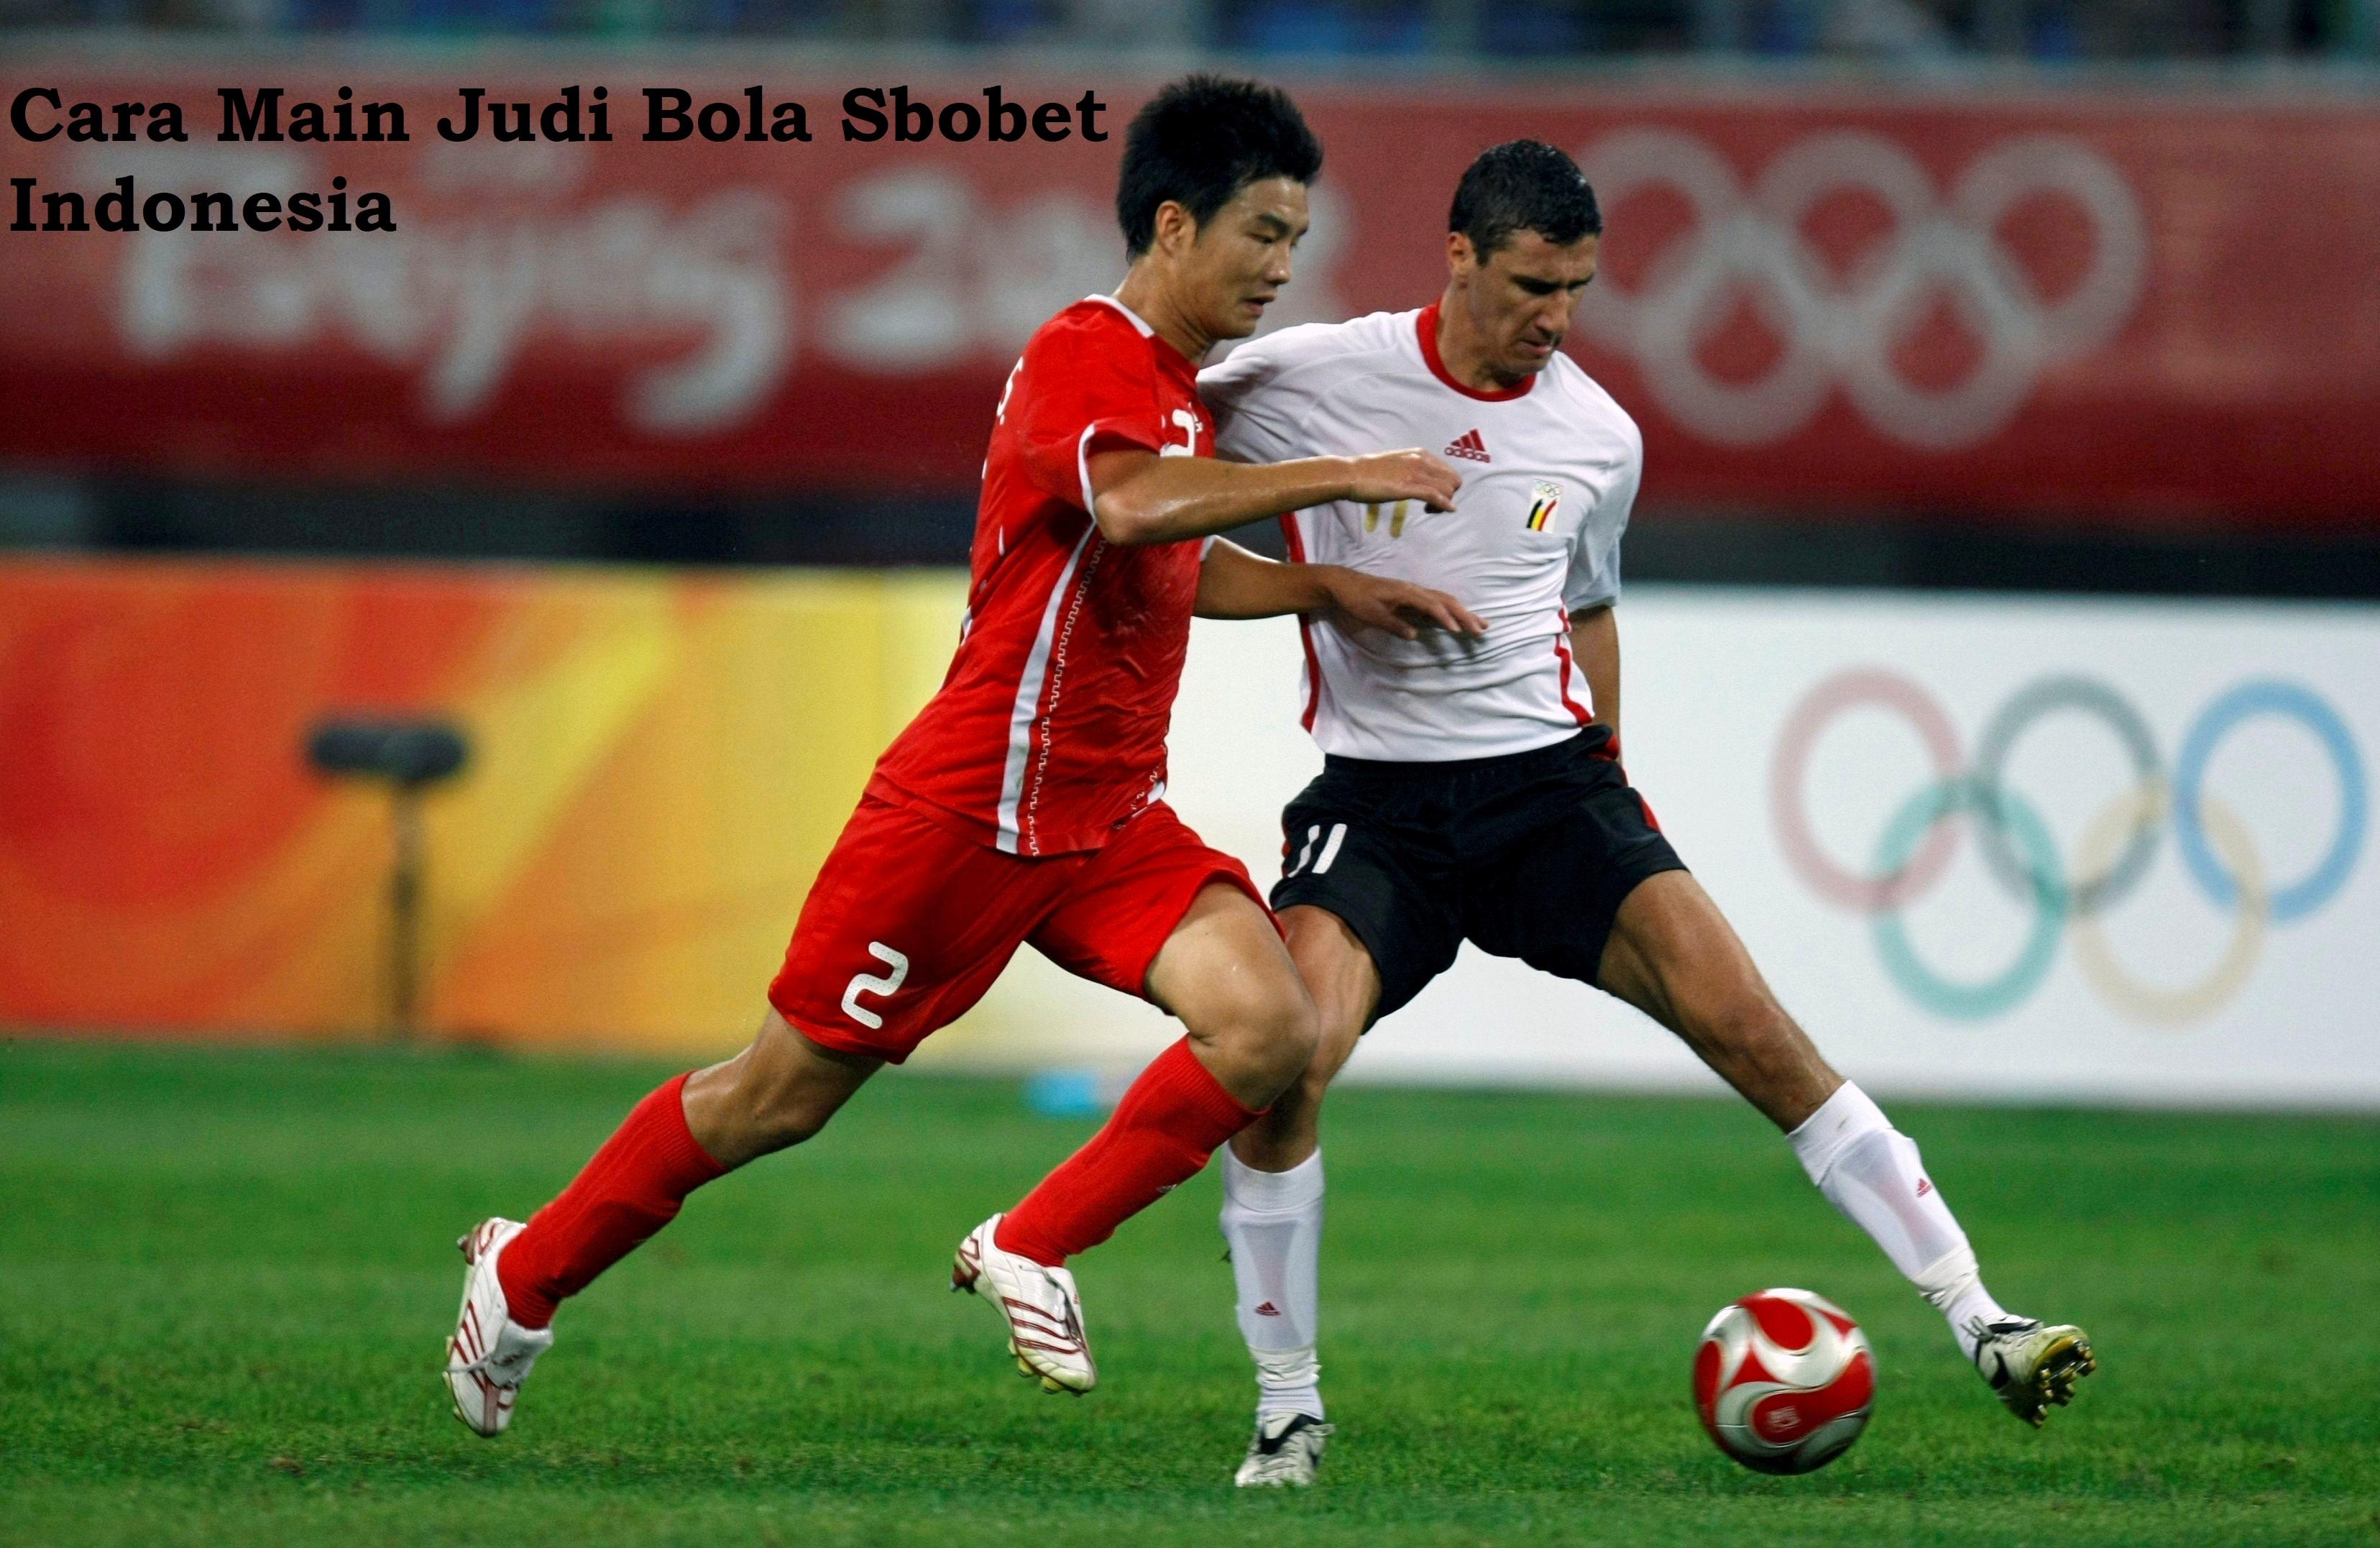 Cara Main Judi Bola Sbobet Indonesia